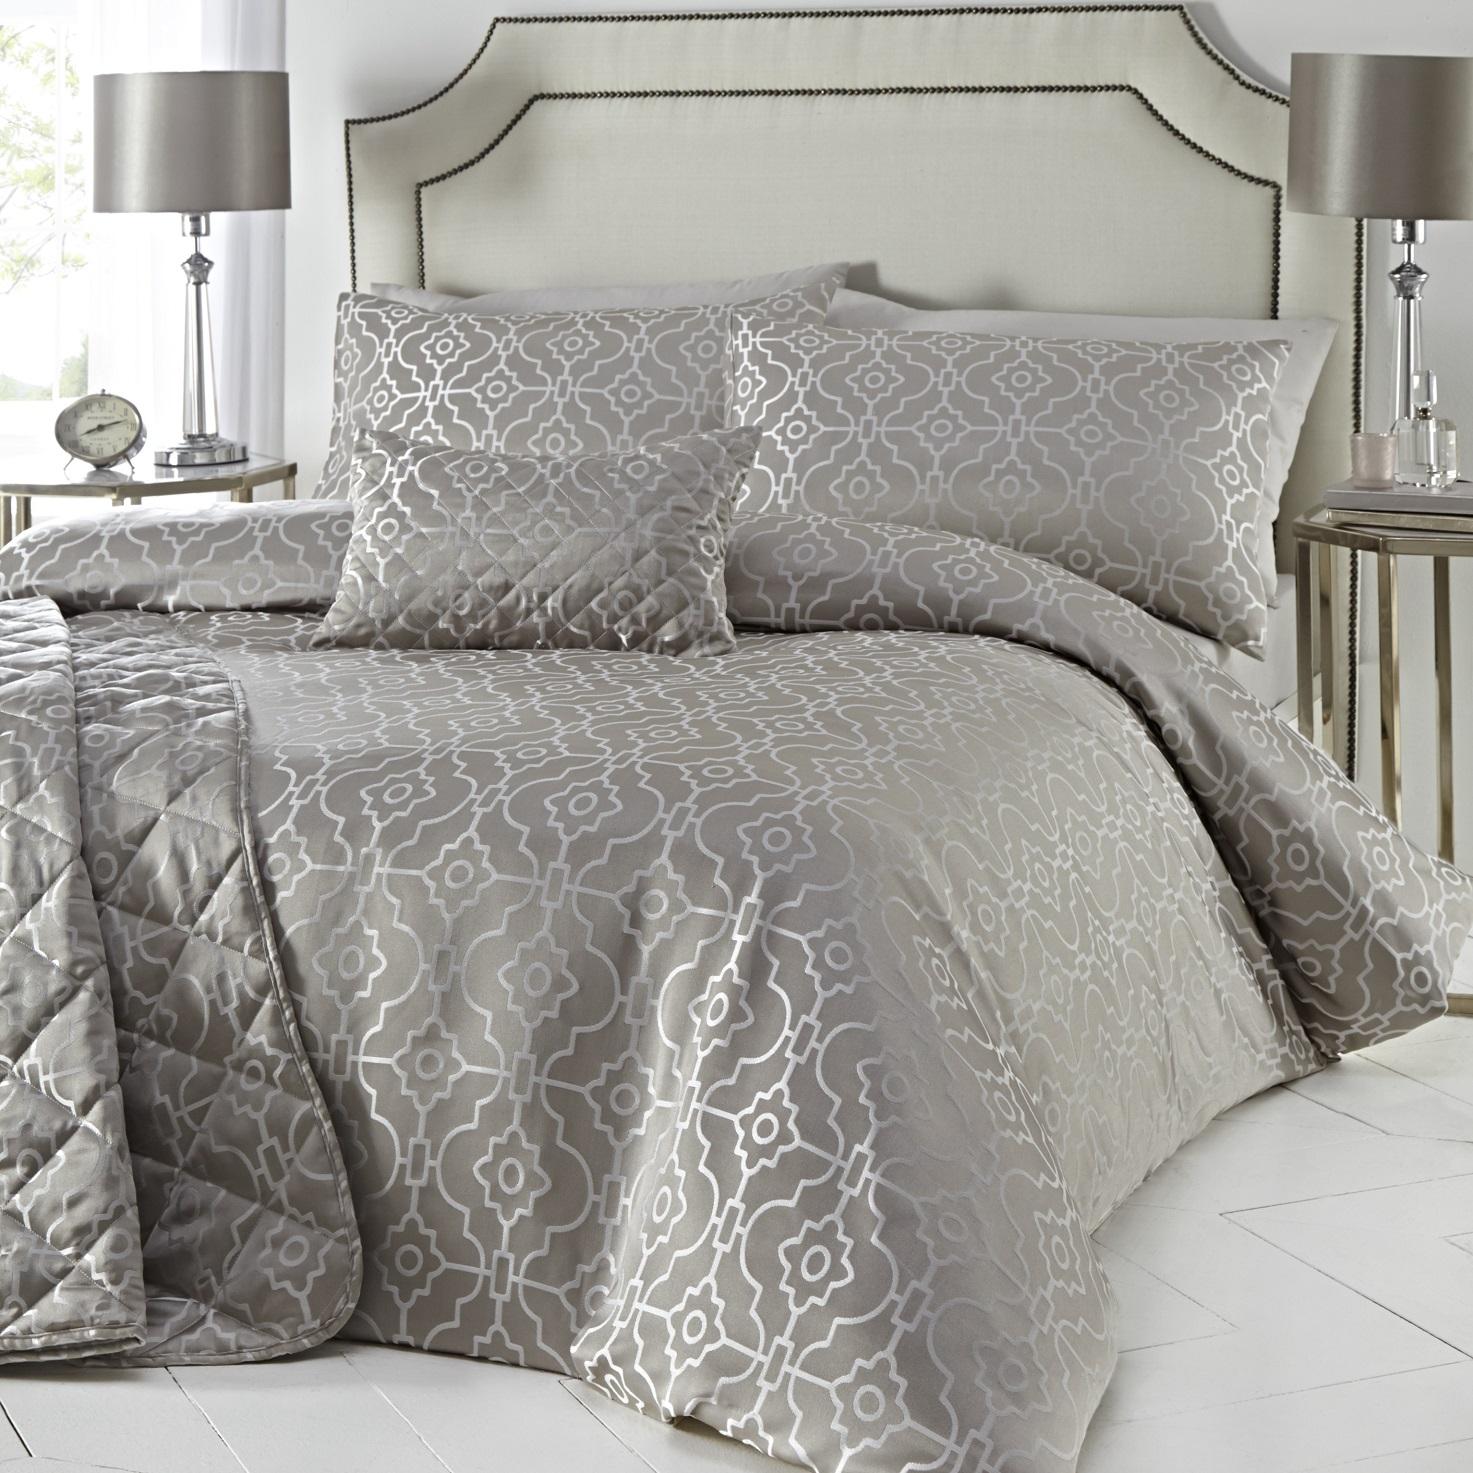 Luxury Geometric Embroidered Jacquard Duvet Cover Set Single Quilt Bedding Set Ebay